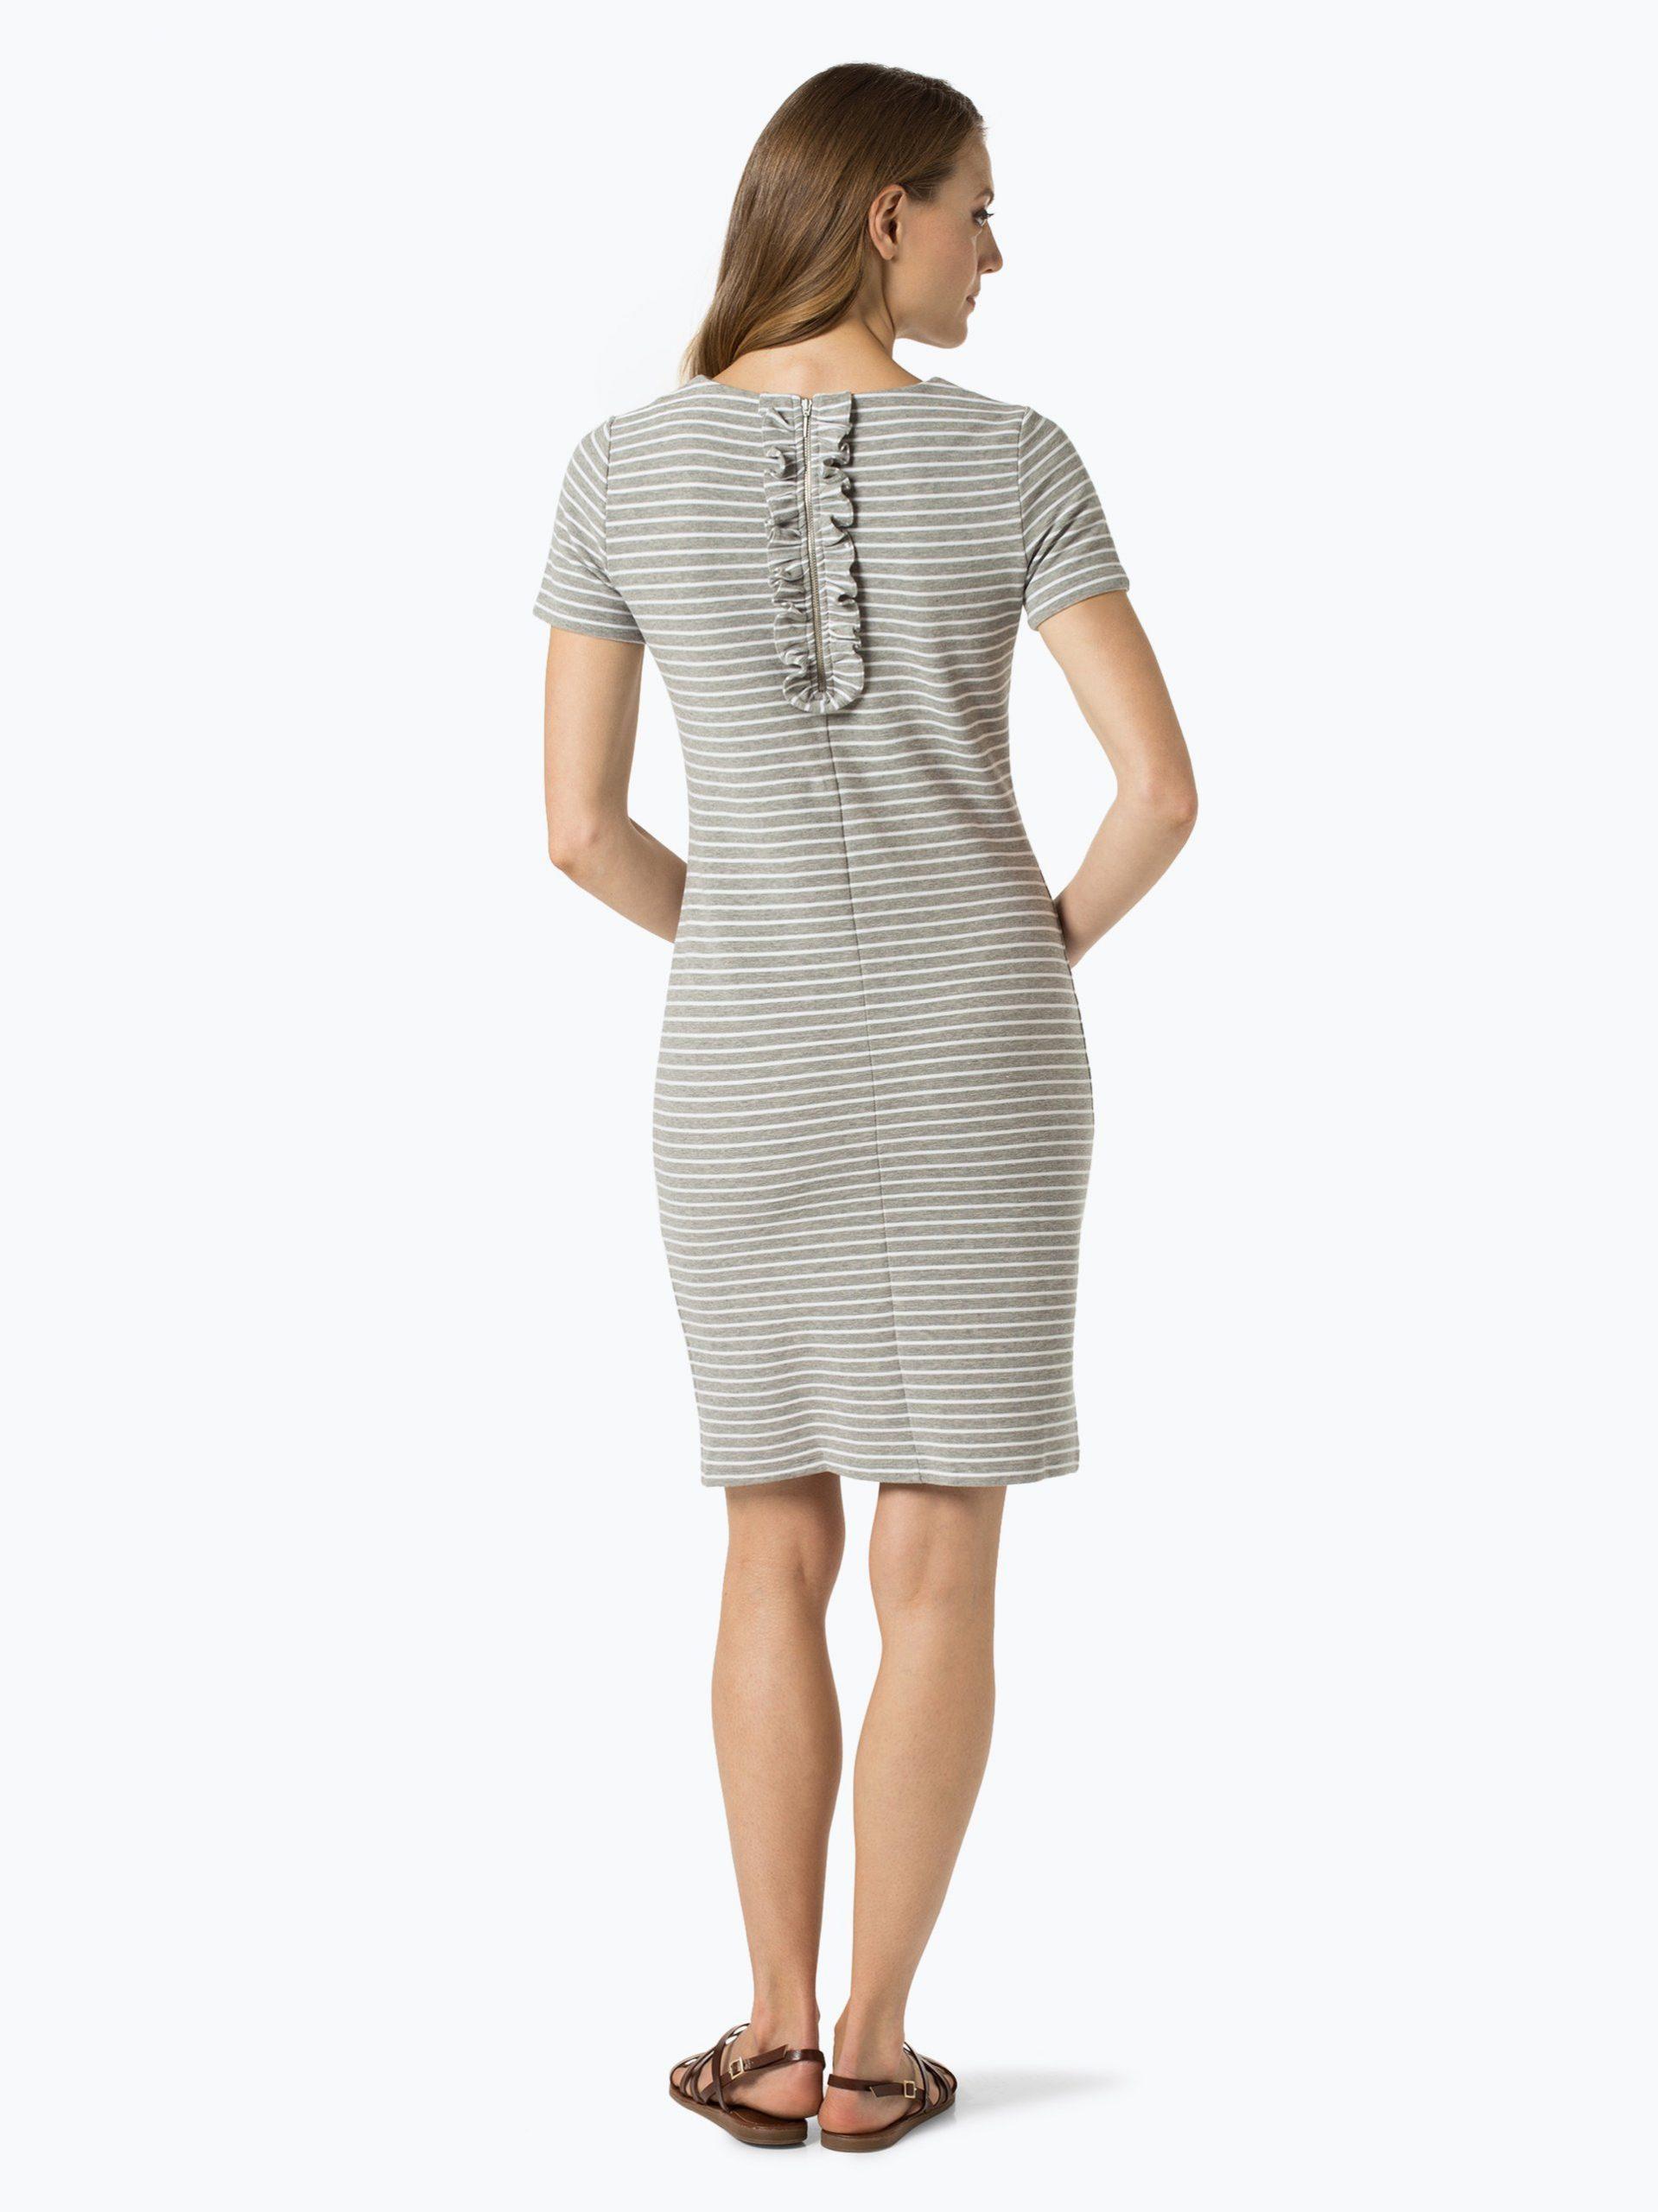 Boss Casual Damen Kleid  Damarino Online Kaufen  Peek